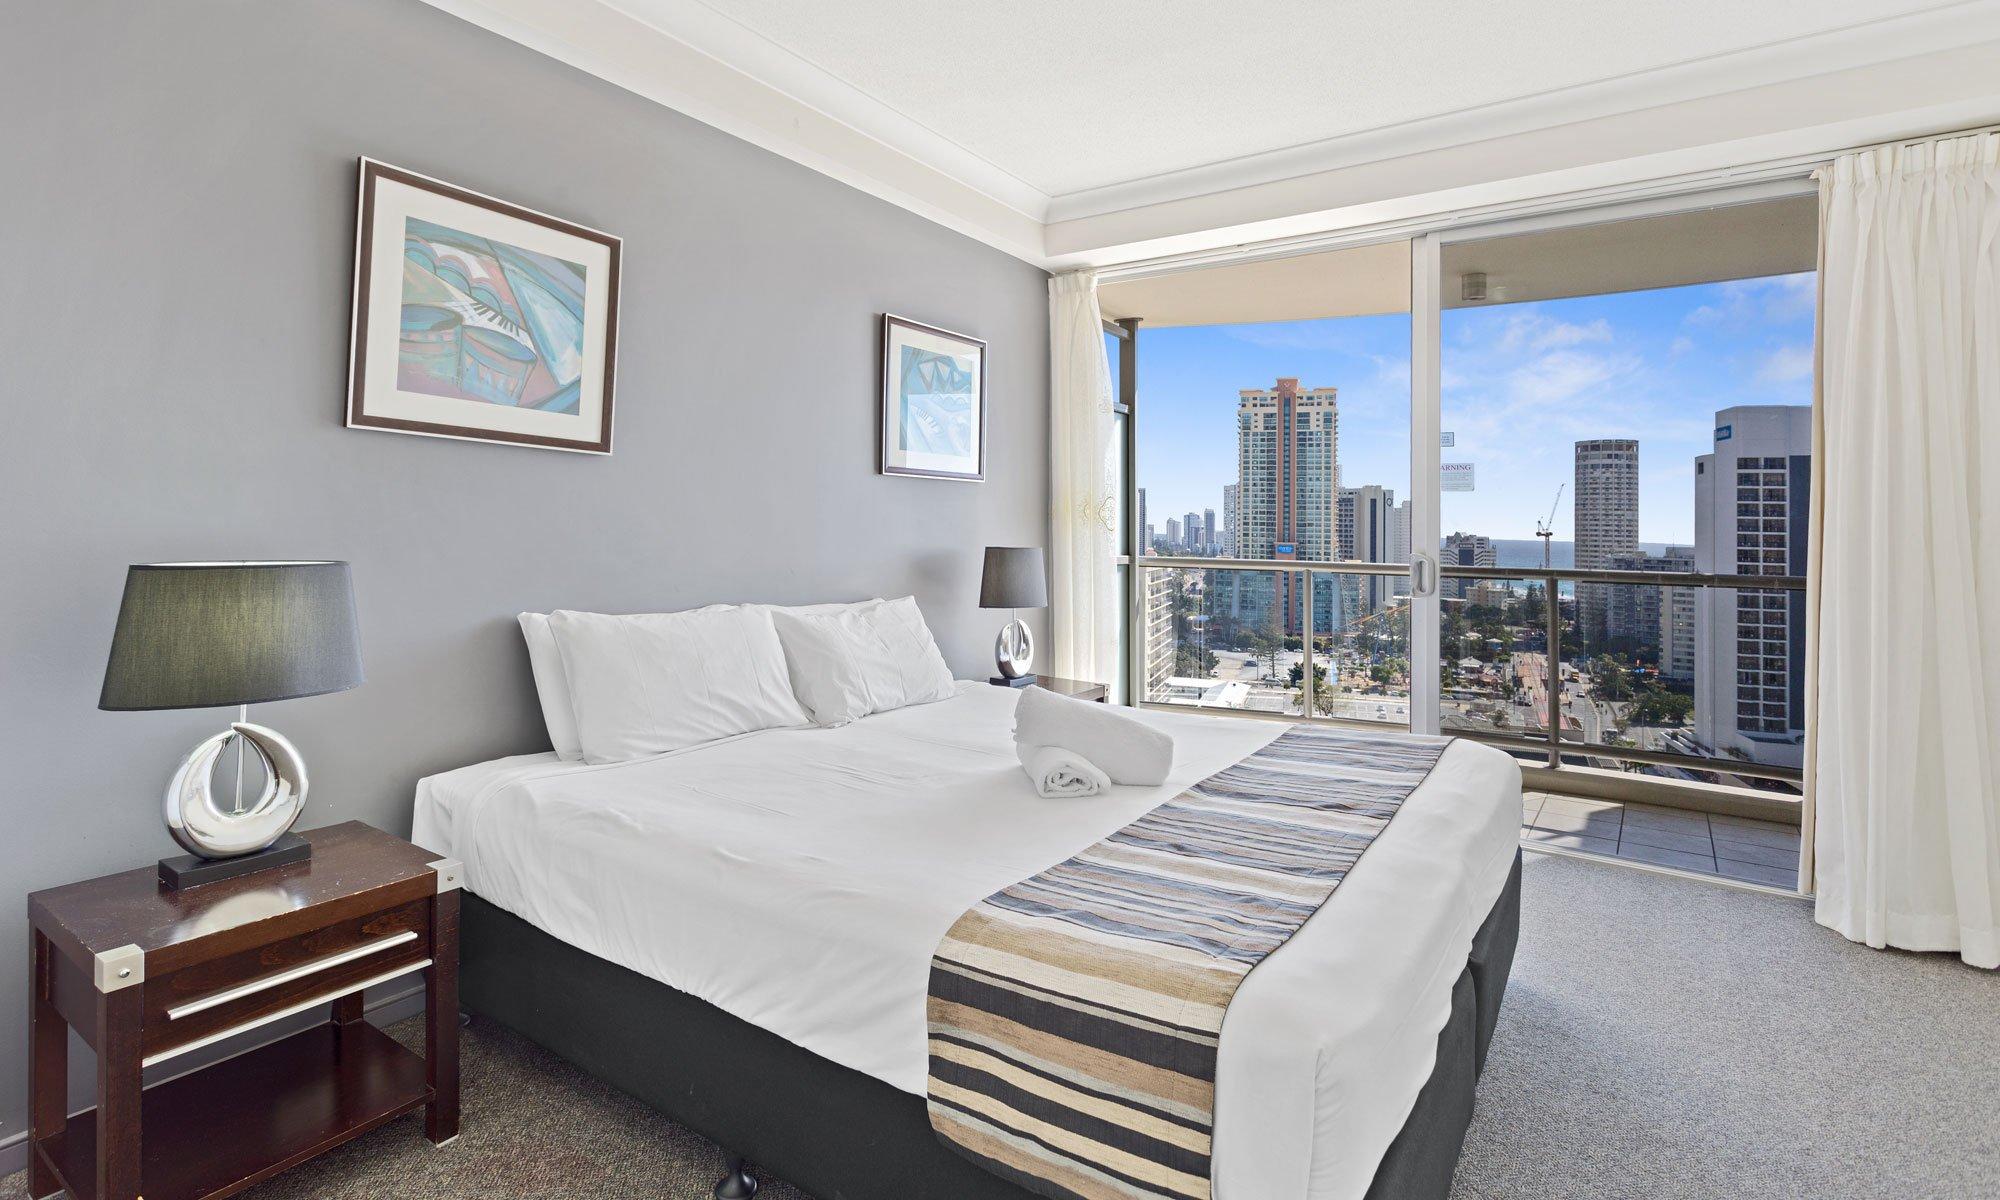 Gold Coast real estate for sale Chevron Renaissance 1171 second bedroom